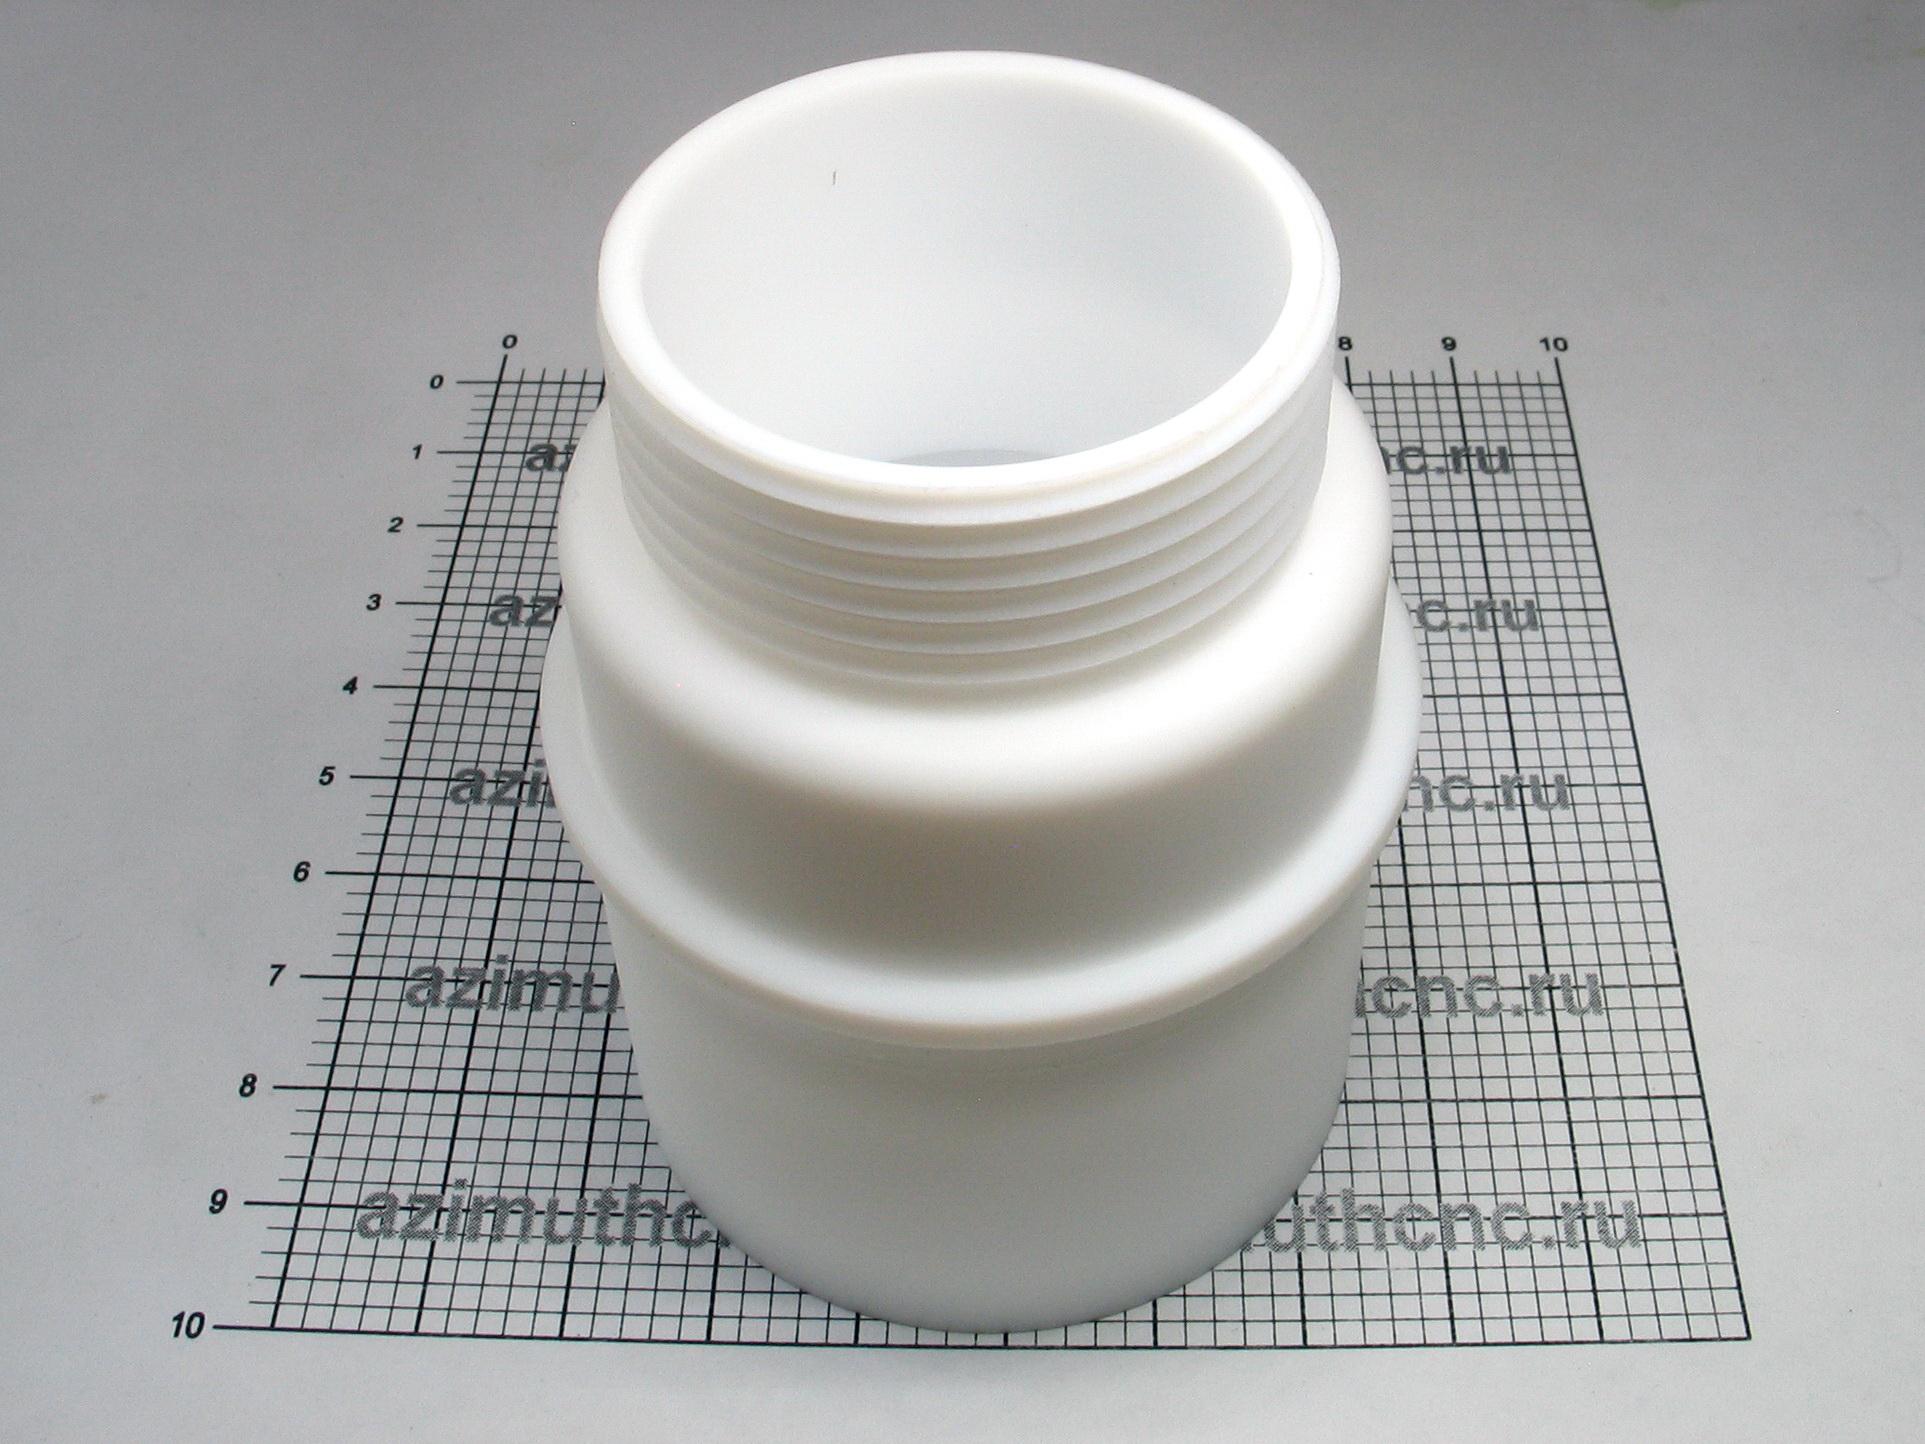 изолятор УФ фторопласт ф4 ту 6-05-810-88